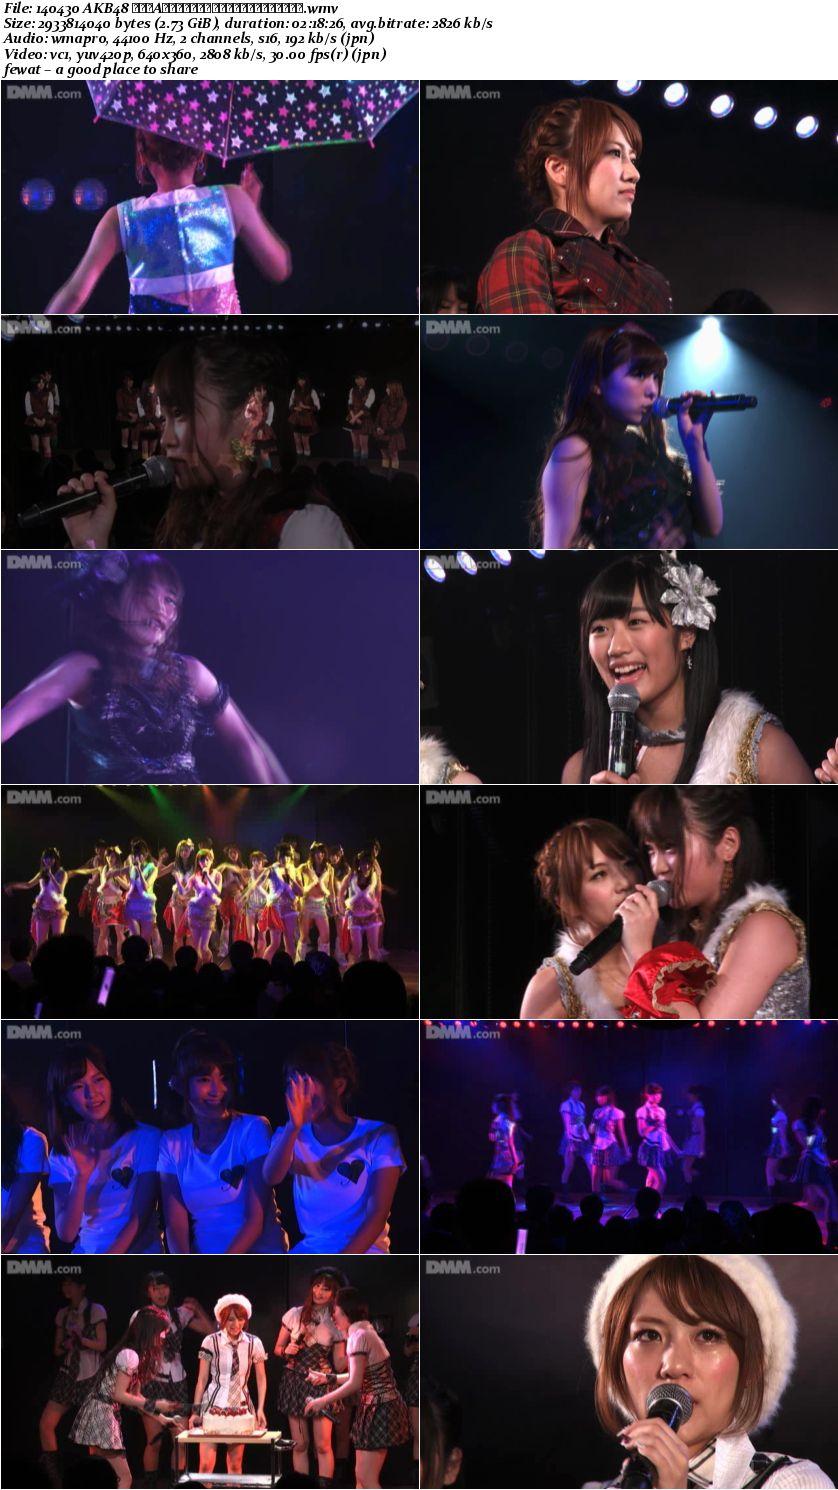 140430 AKB48 チームA「恋愛禁止条例」公演「高橋みなみ生誕祭」.